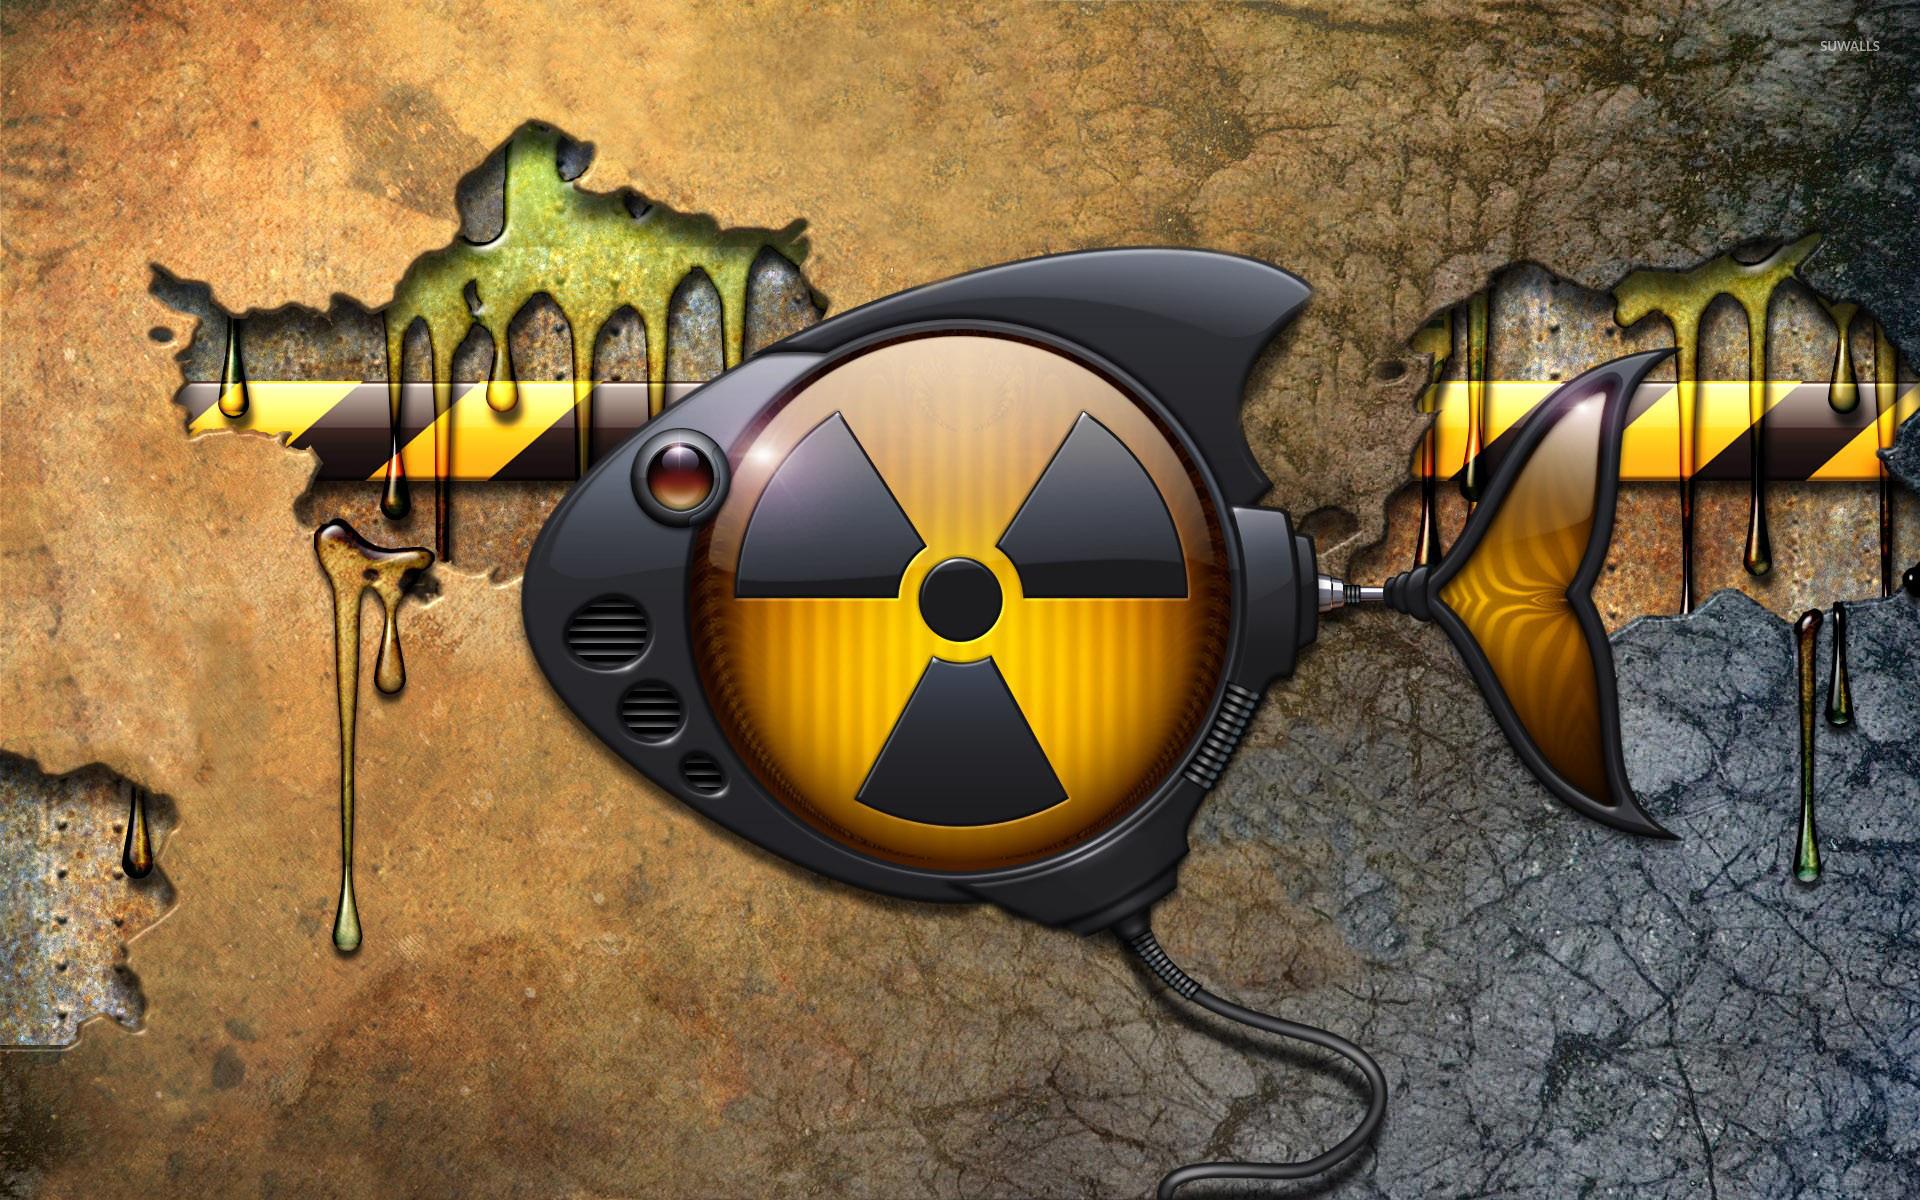 Danger 3d Wallpaper Download Toxic Robot Fish Wallpaper Digital Art Wallpapers 21505